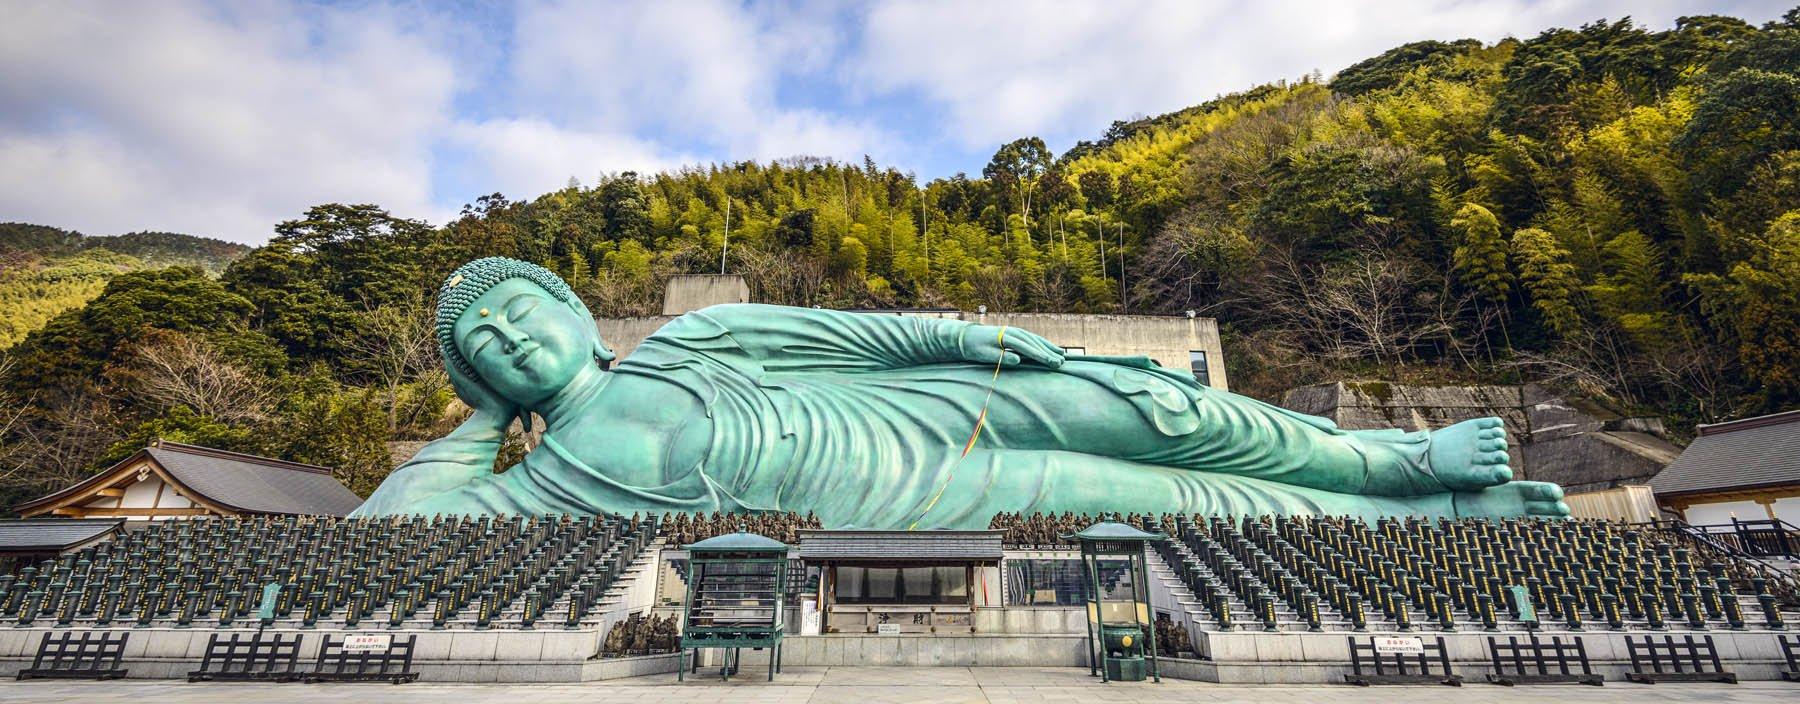 jp, fukuoka, de liggende buddha van nanzoin tempel.jpg